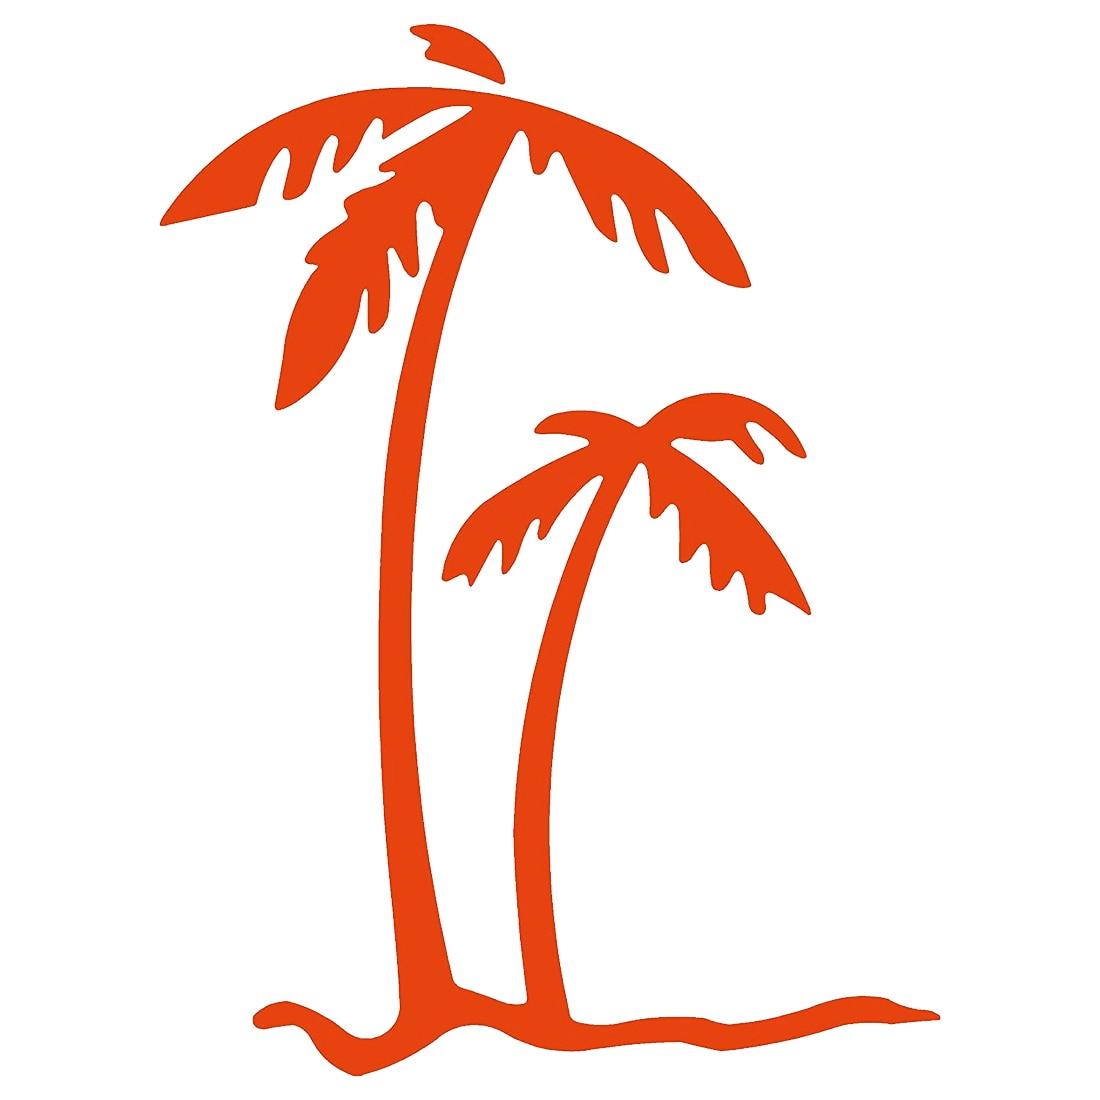 PALM TREES - Tropical Beach - Decal (4inch, Orange)